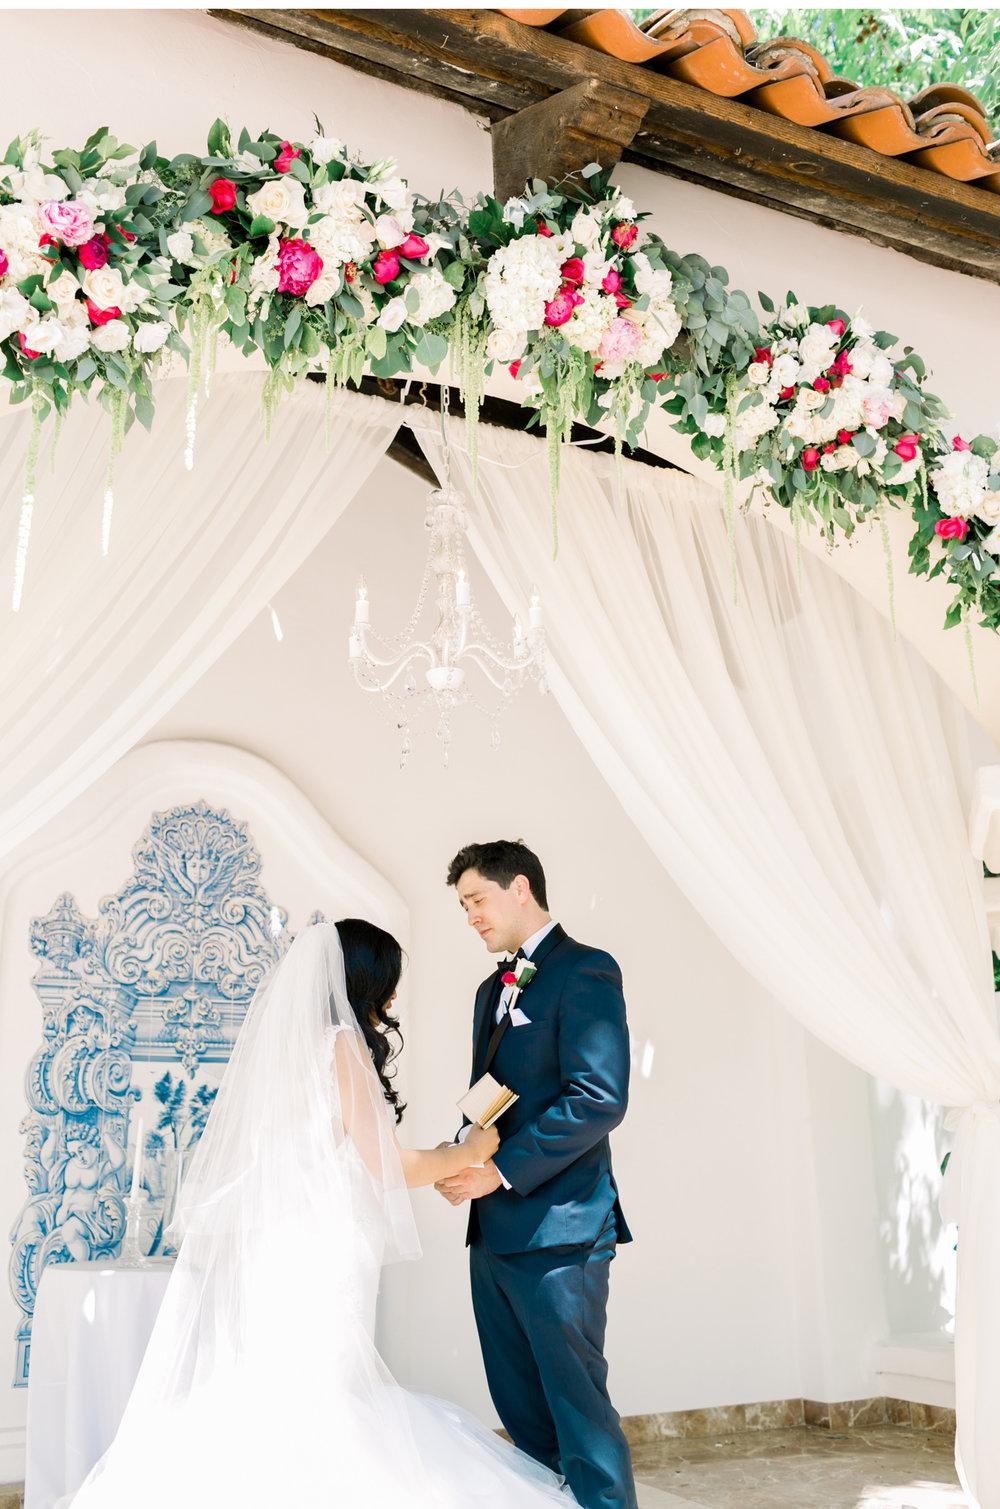 Rancho-Las-Lomas-Style-Me-Pretty-Wedding-Natalie-Schutt-Photography_08.jpg